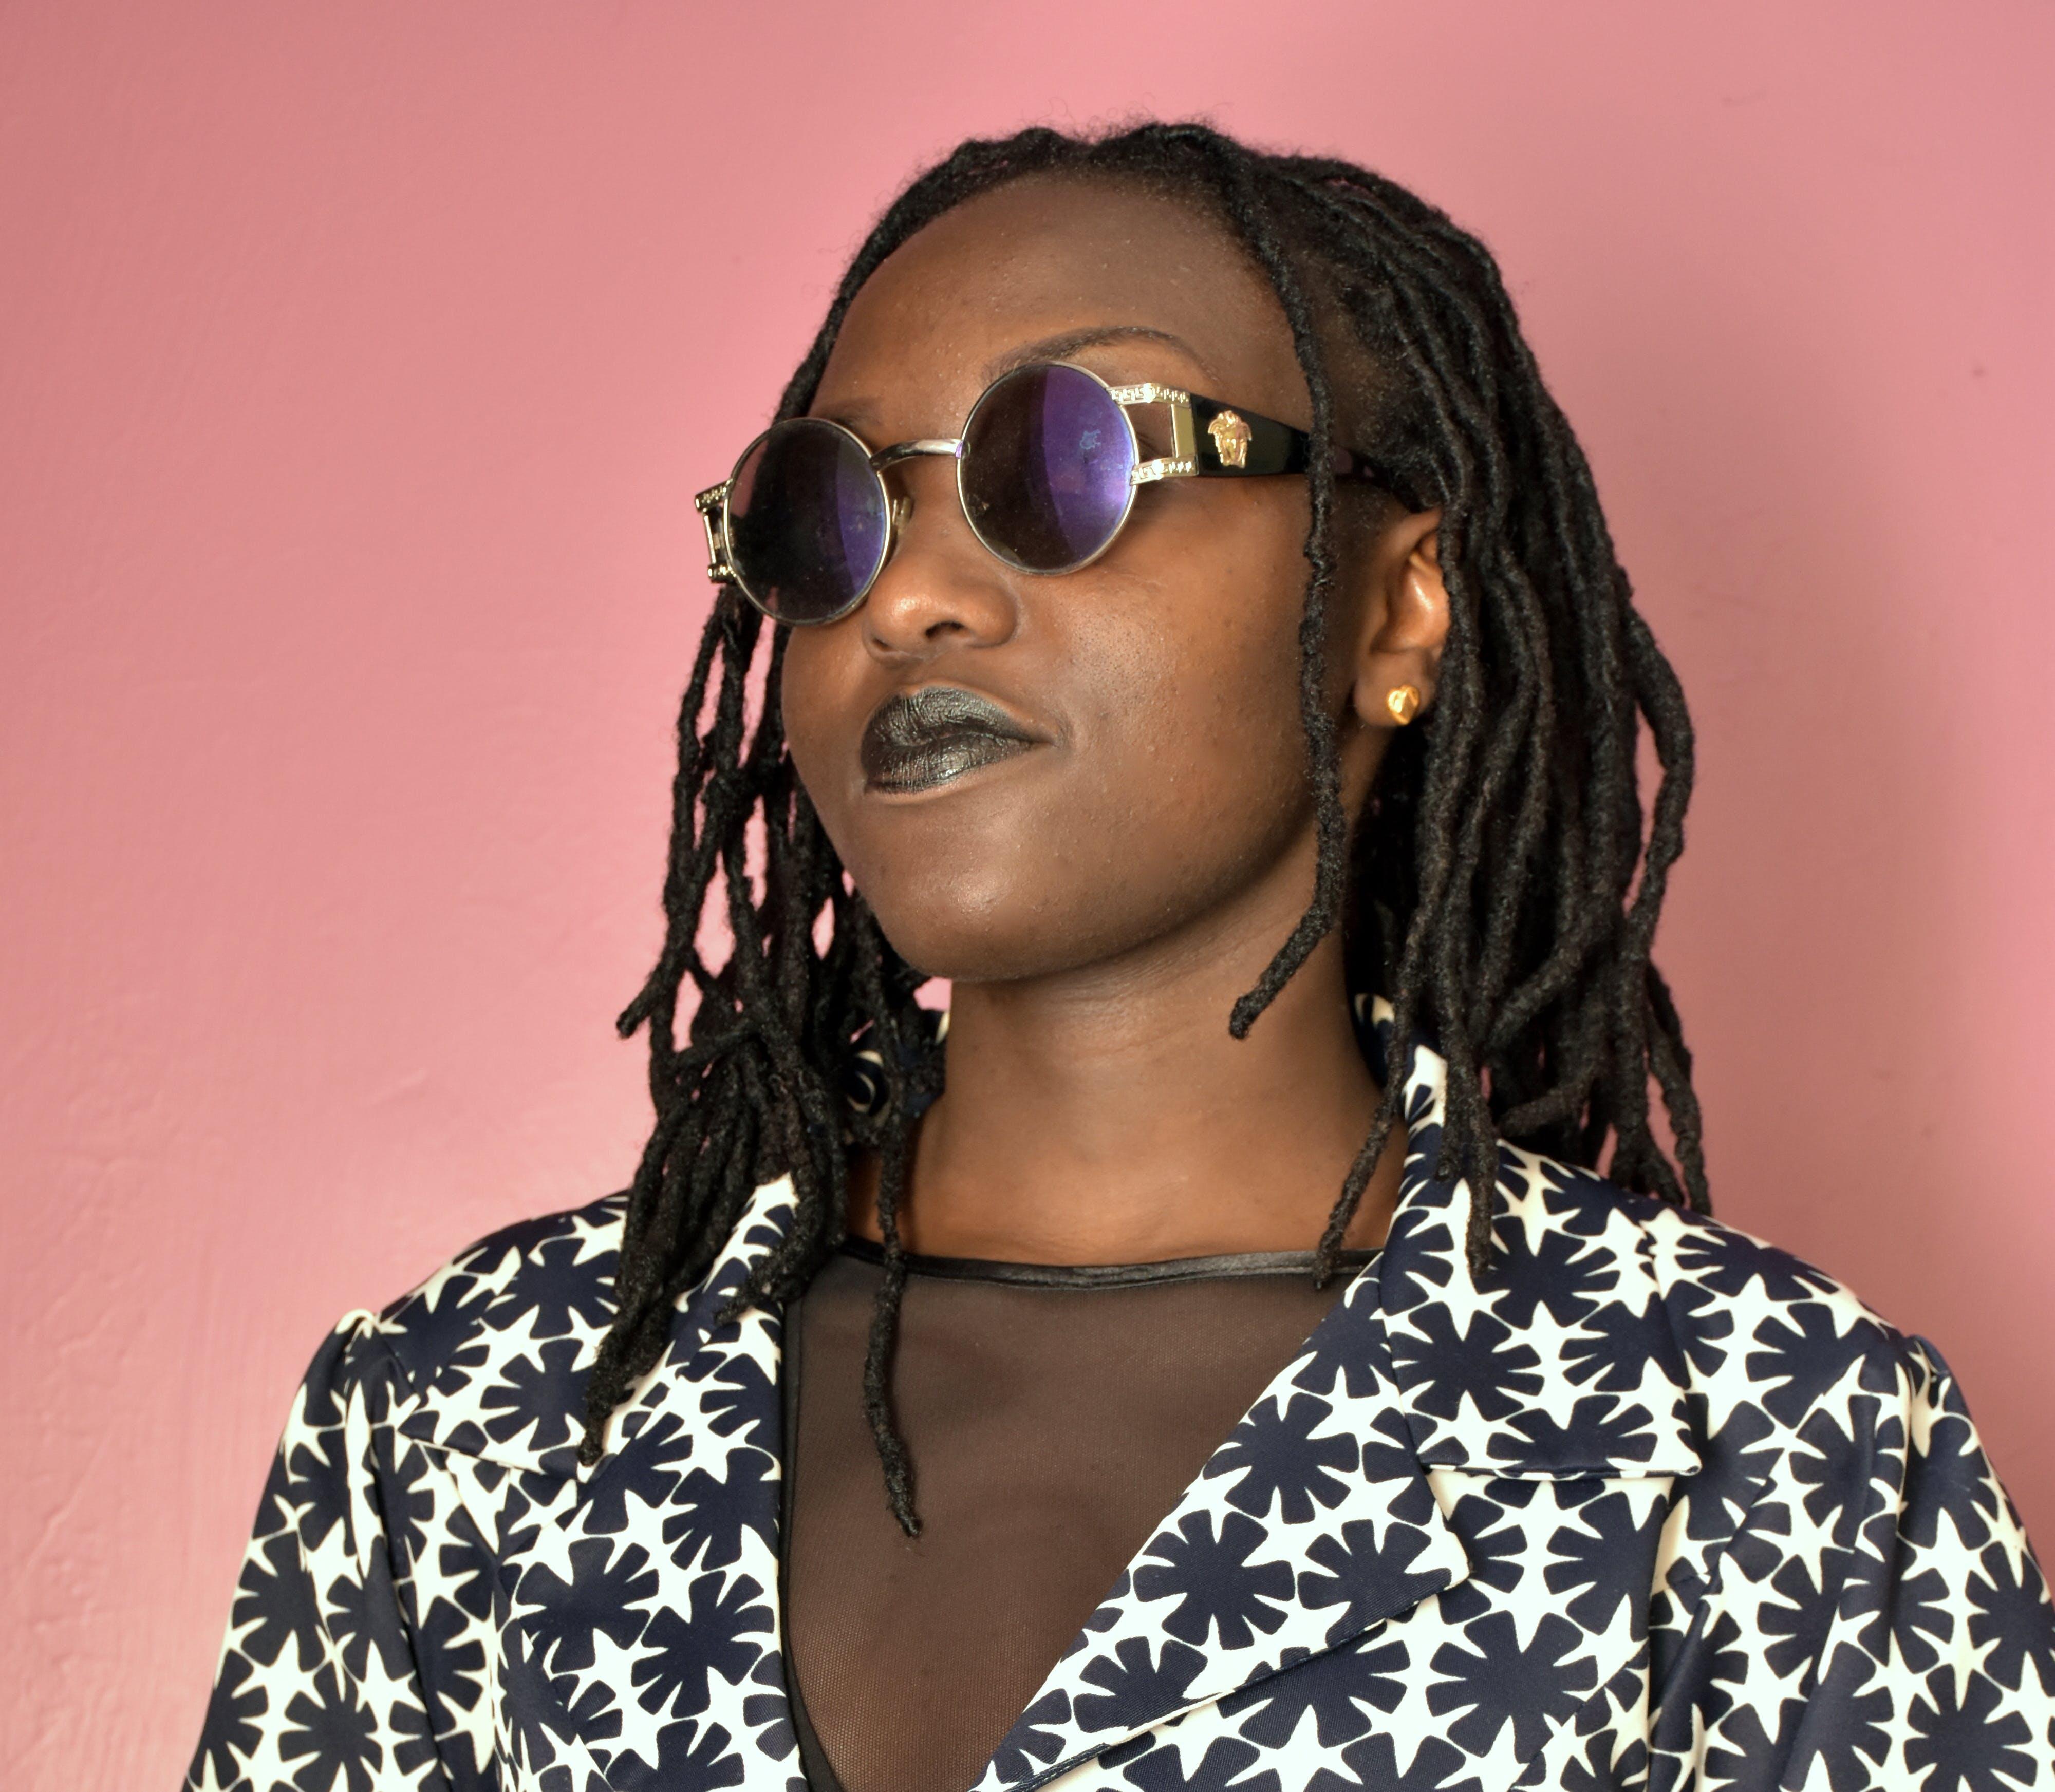 Woman Wearing Silver Framed Hippie Sunglasses